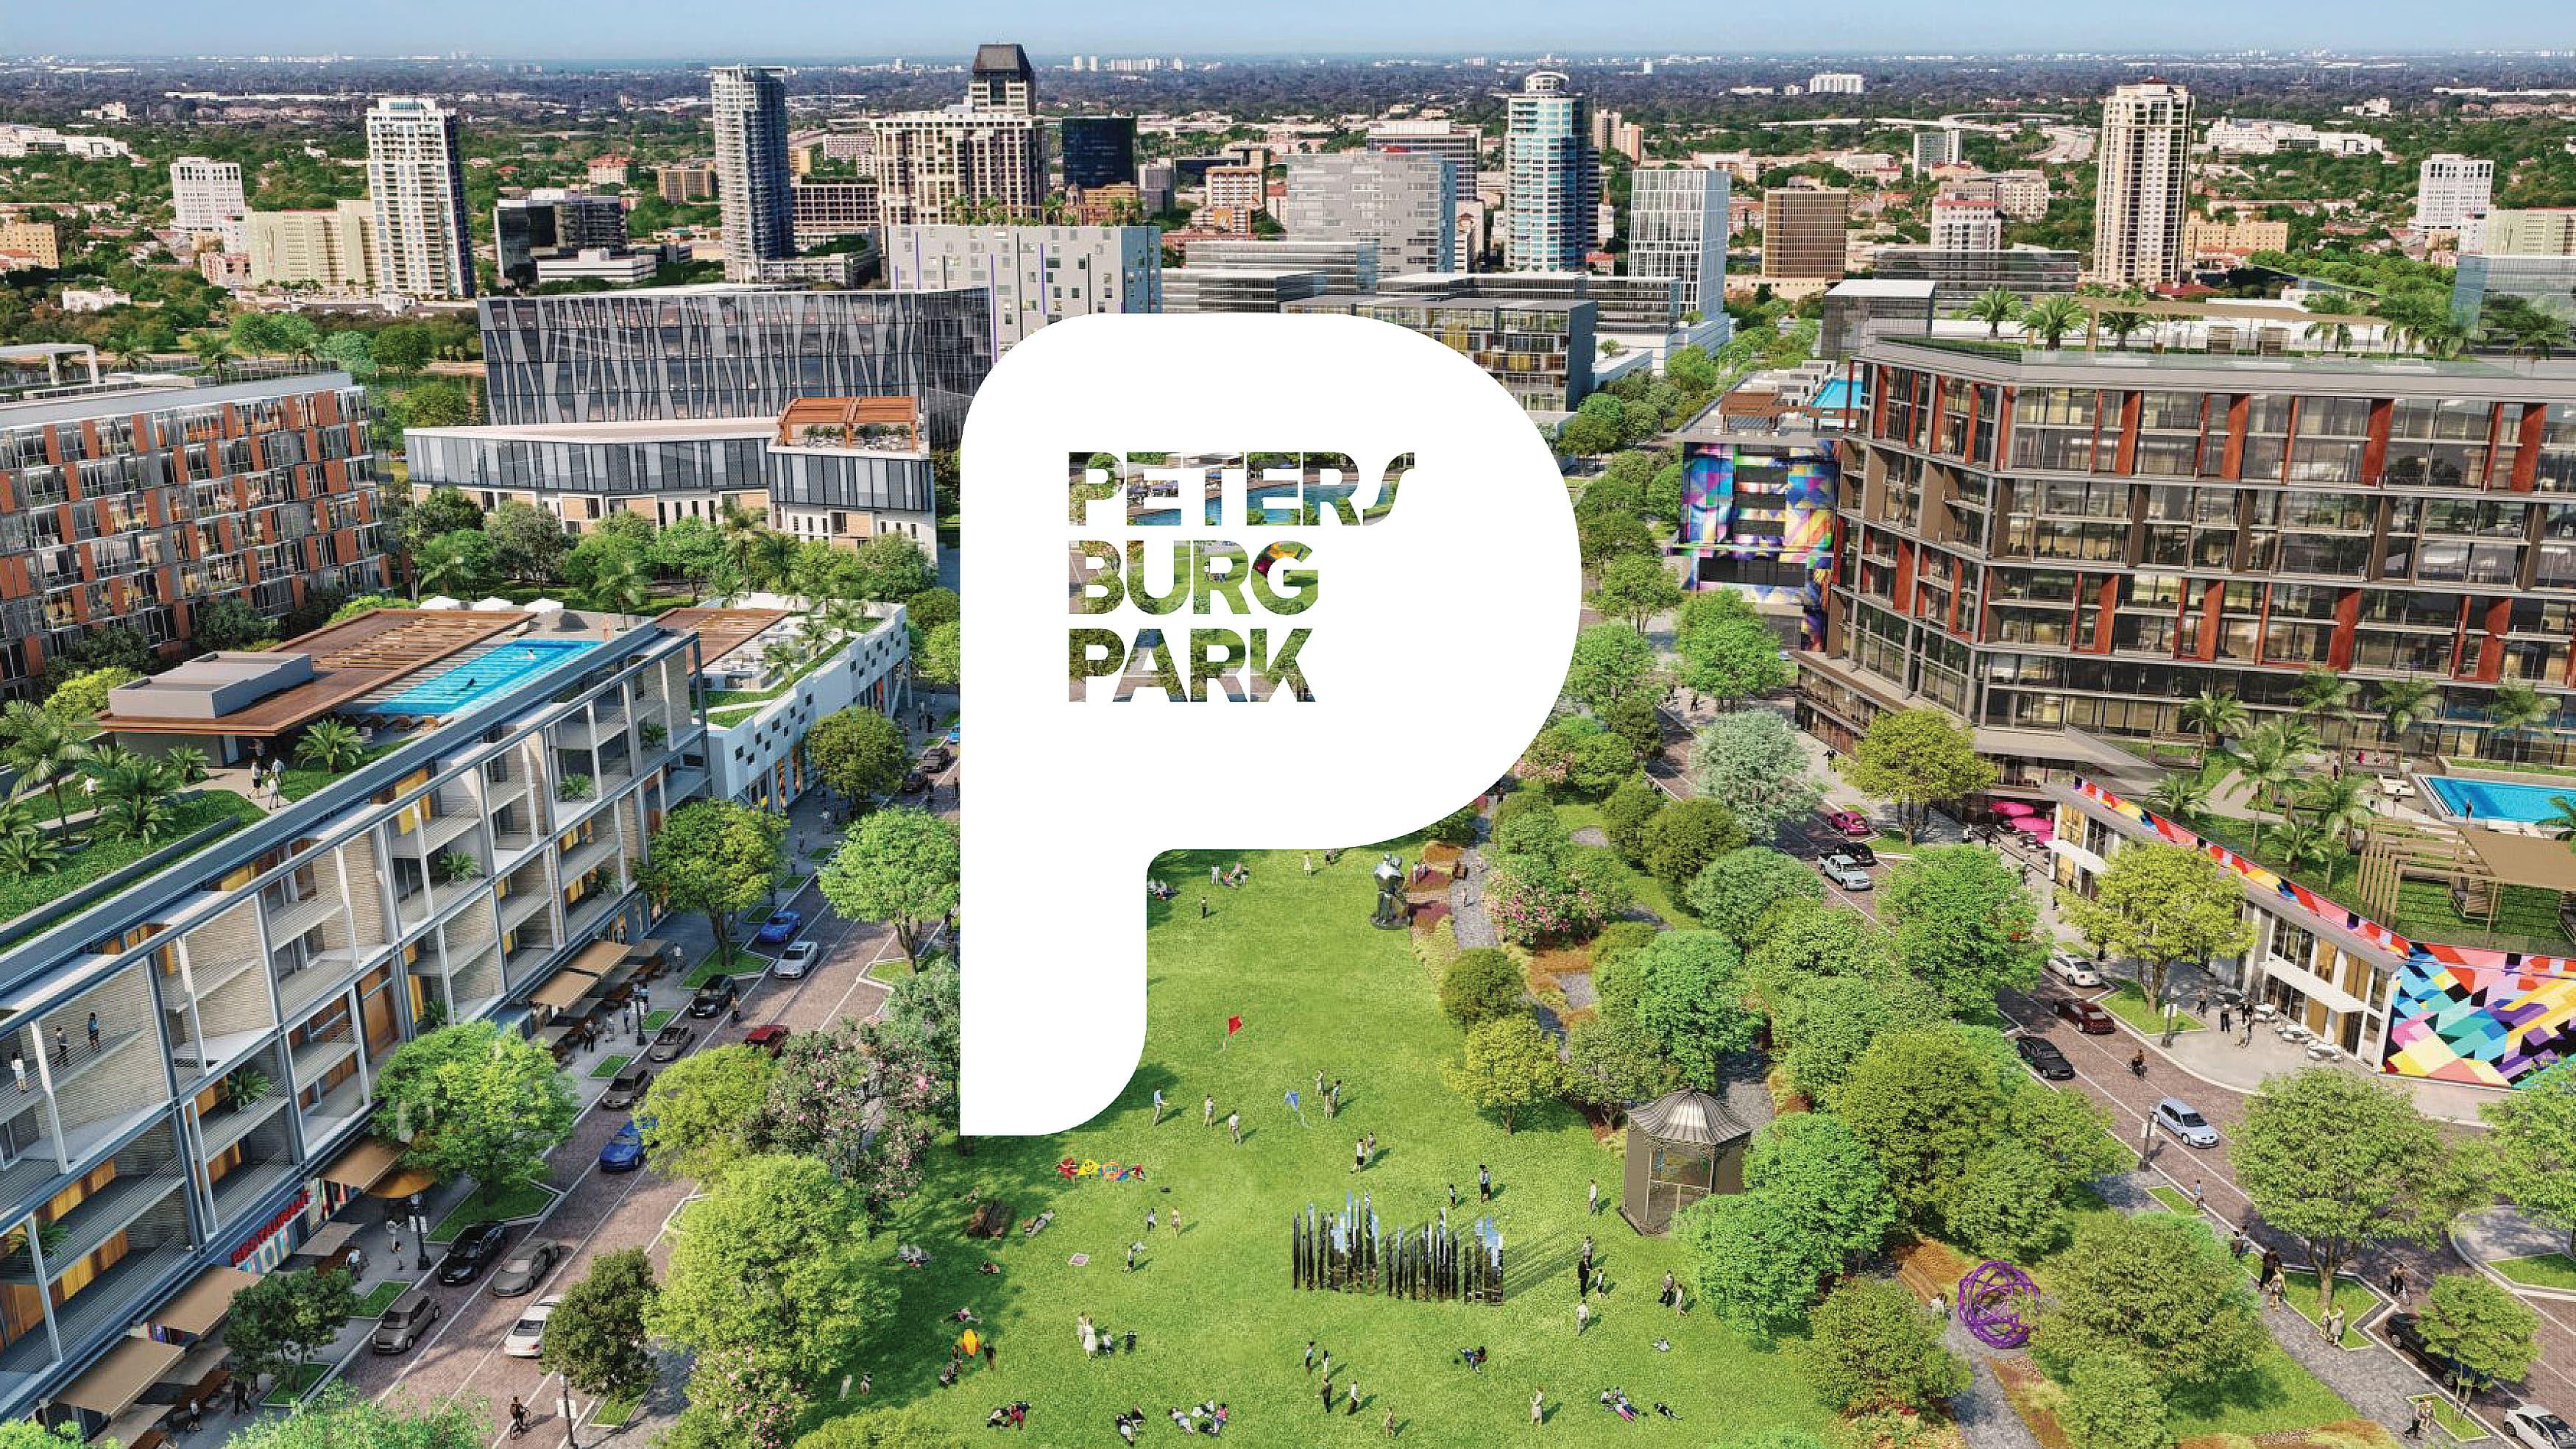 Logo design for Petersburg Park by RSM Design on an aerial rendering of a park.